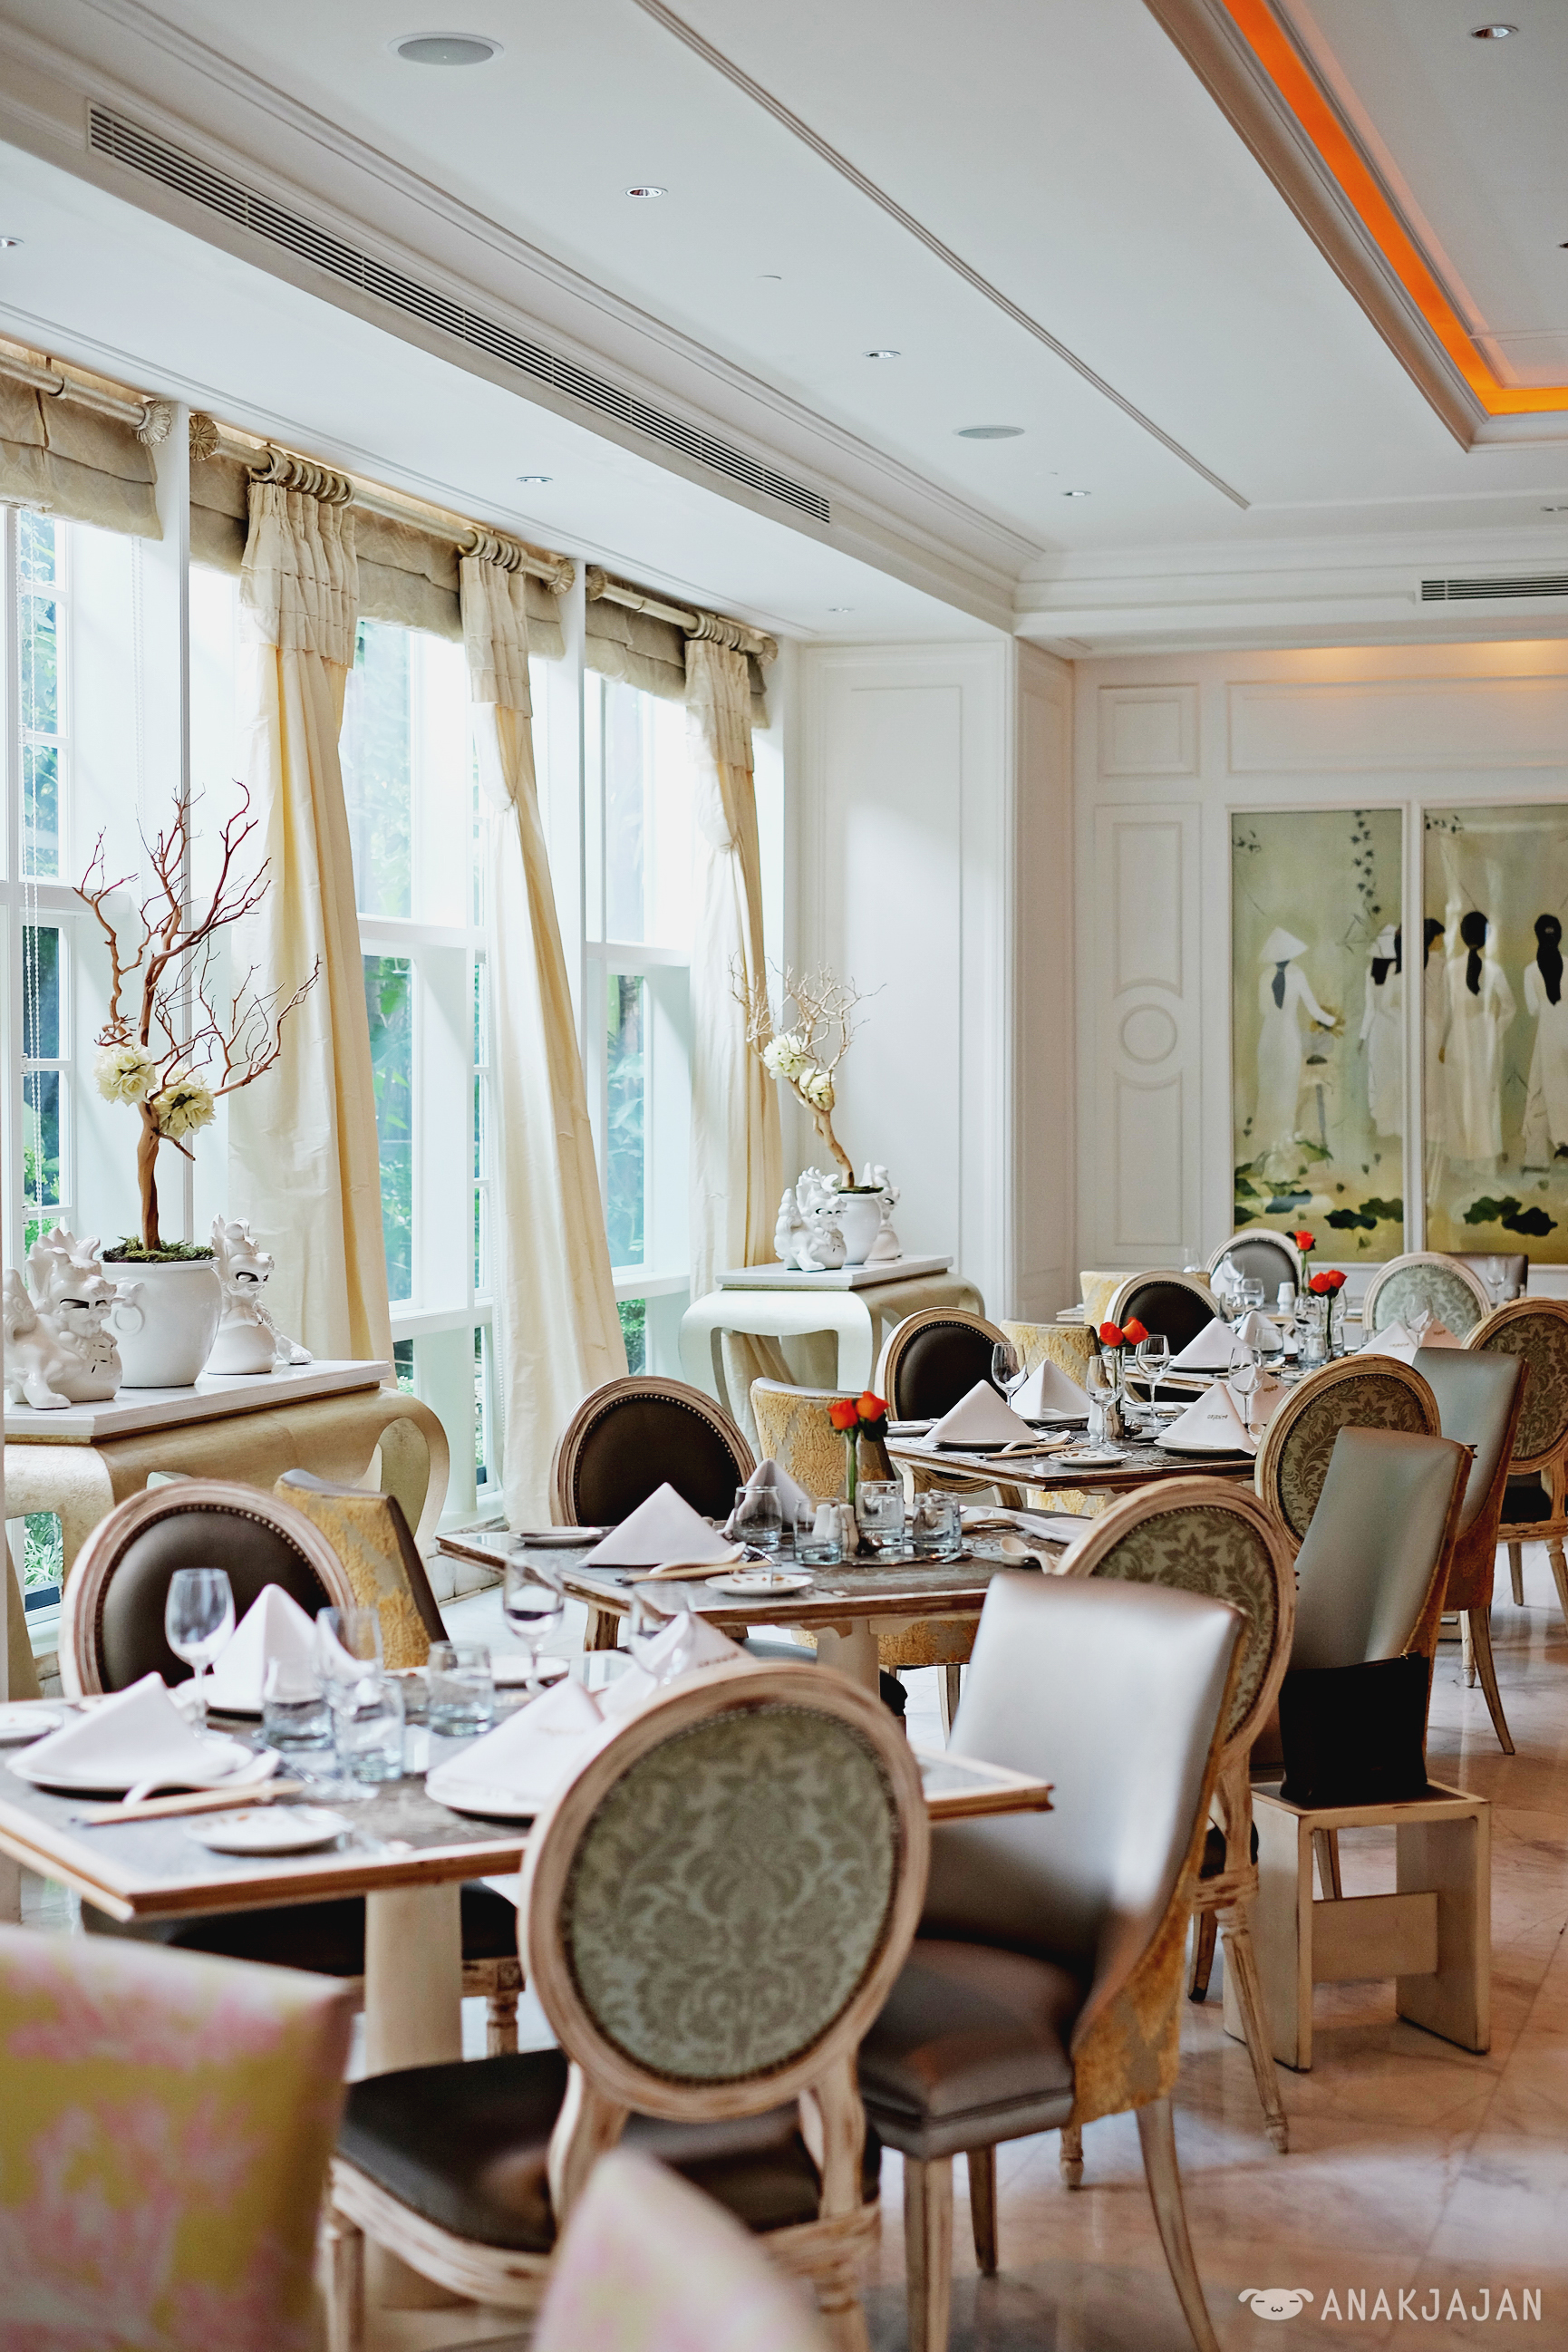 Sunday Brunch Orient 8 Hotel Mulia Senayan Jakarta Anakjajan Com